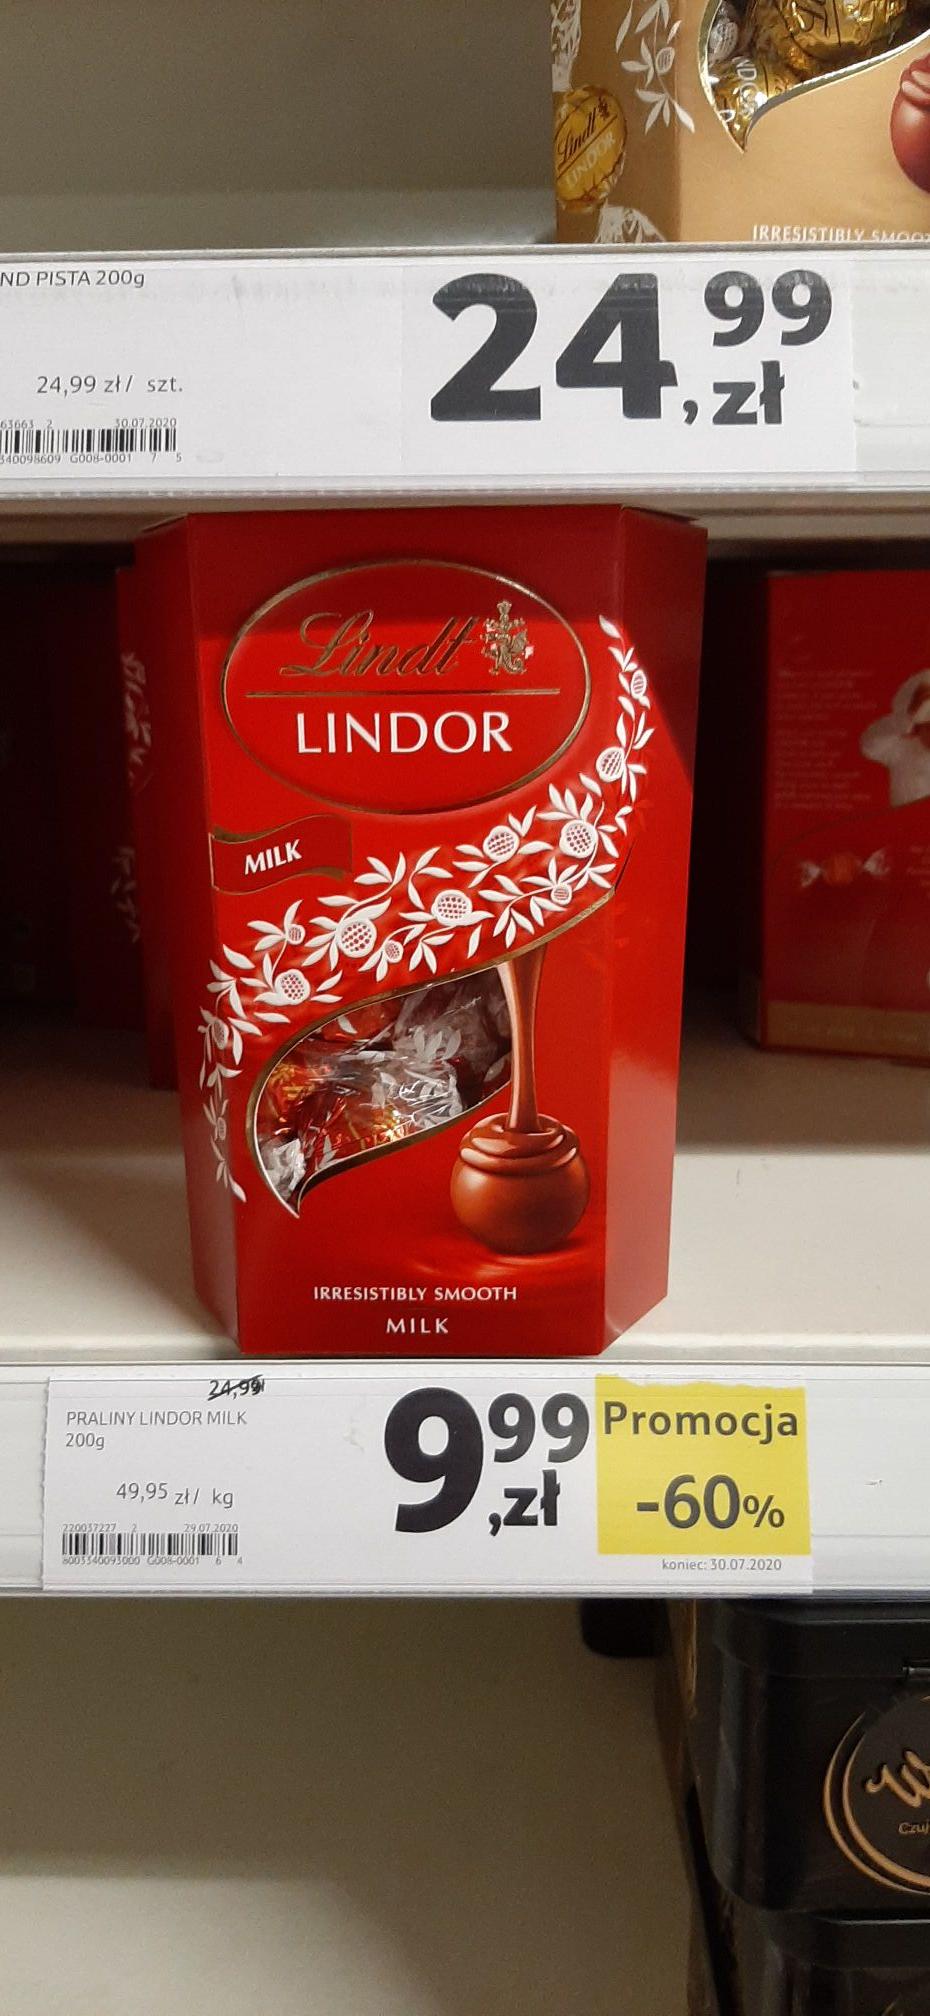 Praliny Lindor Milk 200g @ Trzebnica